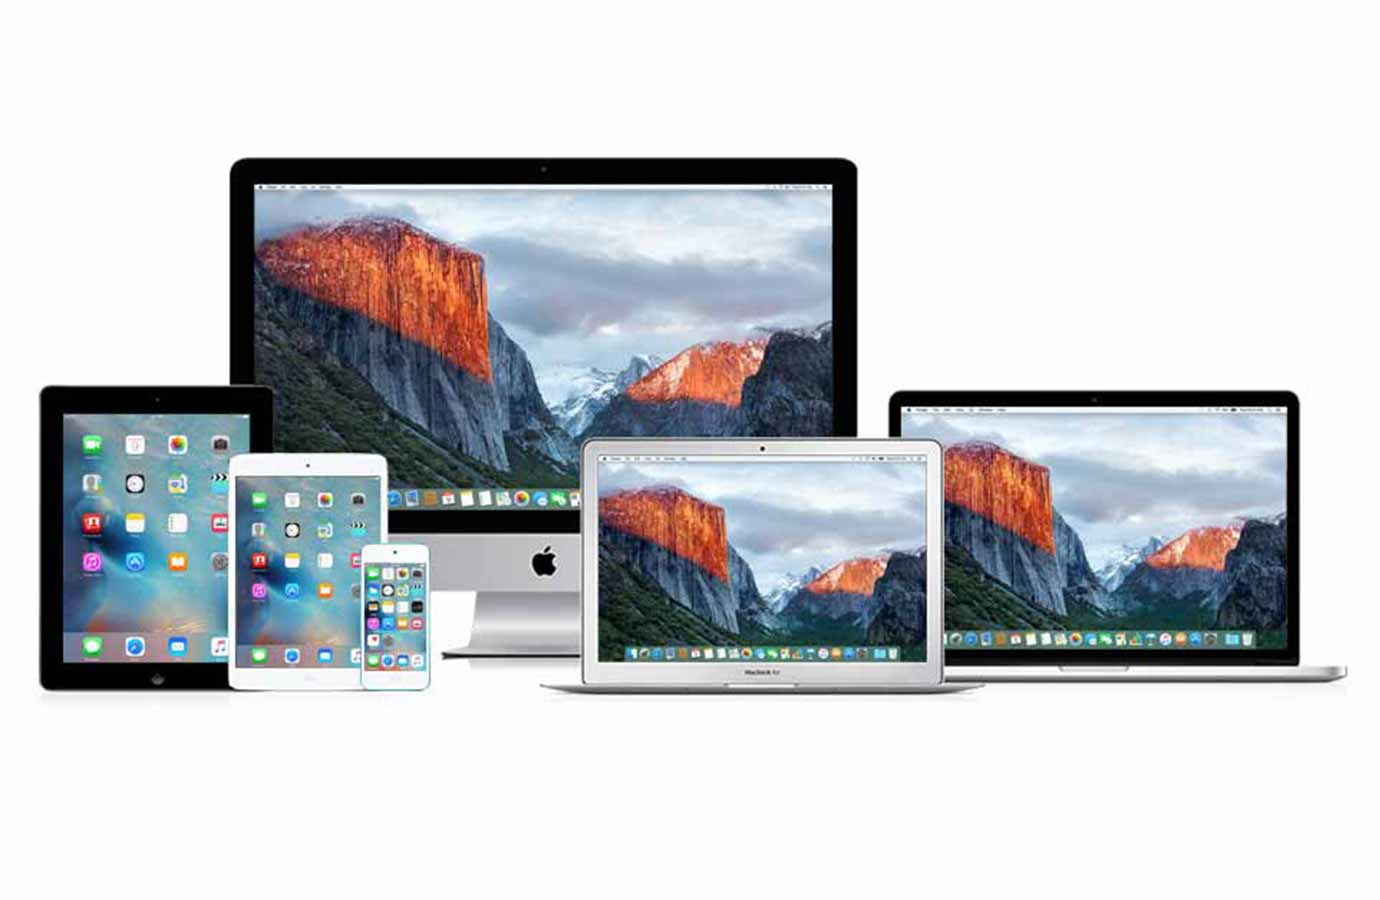 Apple、Mac整備済製品情報 (2017年4月25日)ー 13インチMacBook Pro TouchBarモデルが初登場!